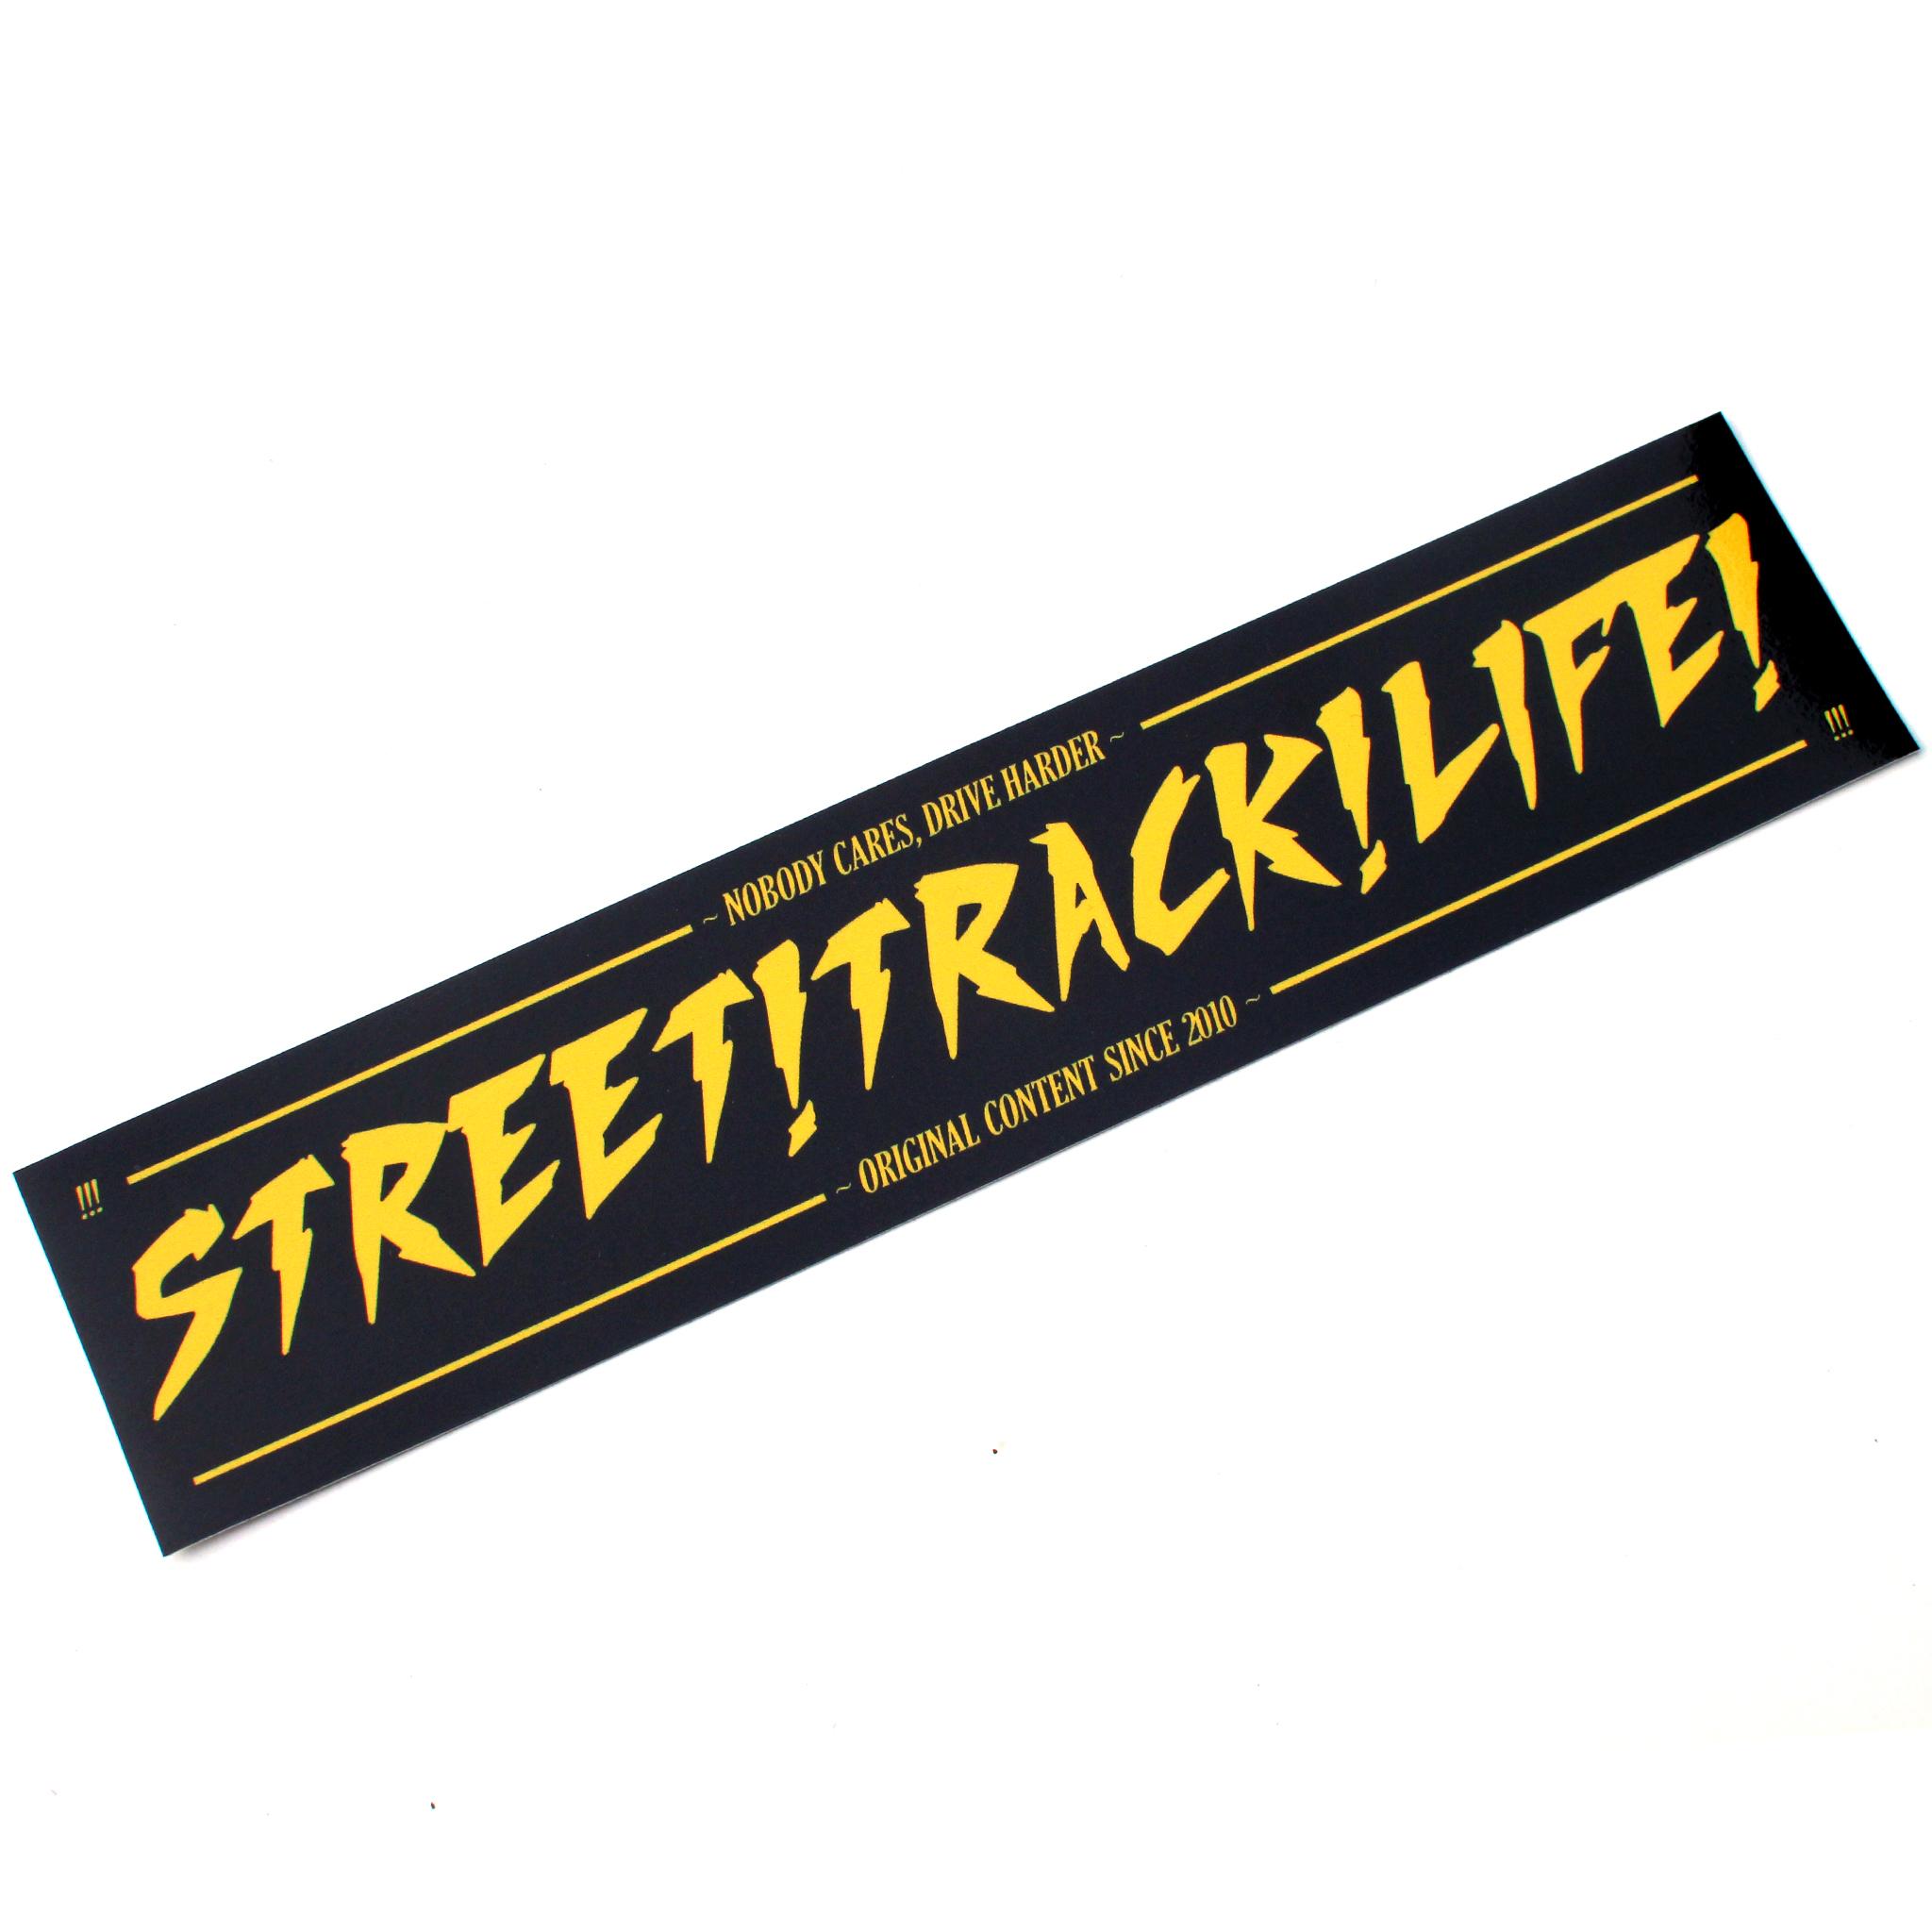 STREET TRACK LIFE STICKER